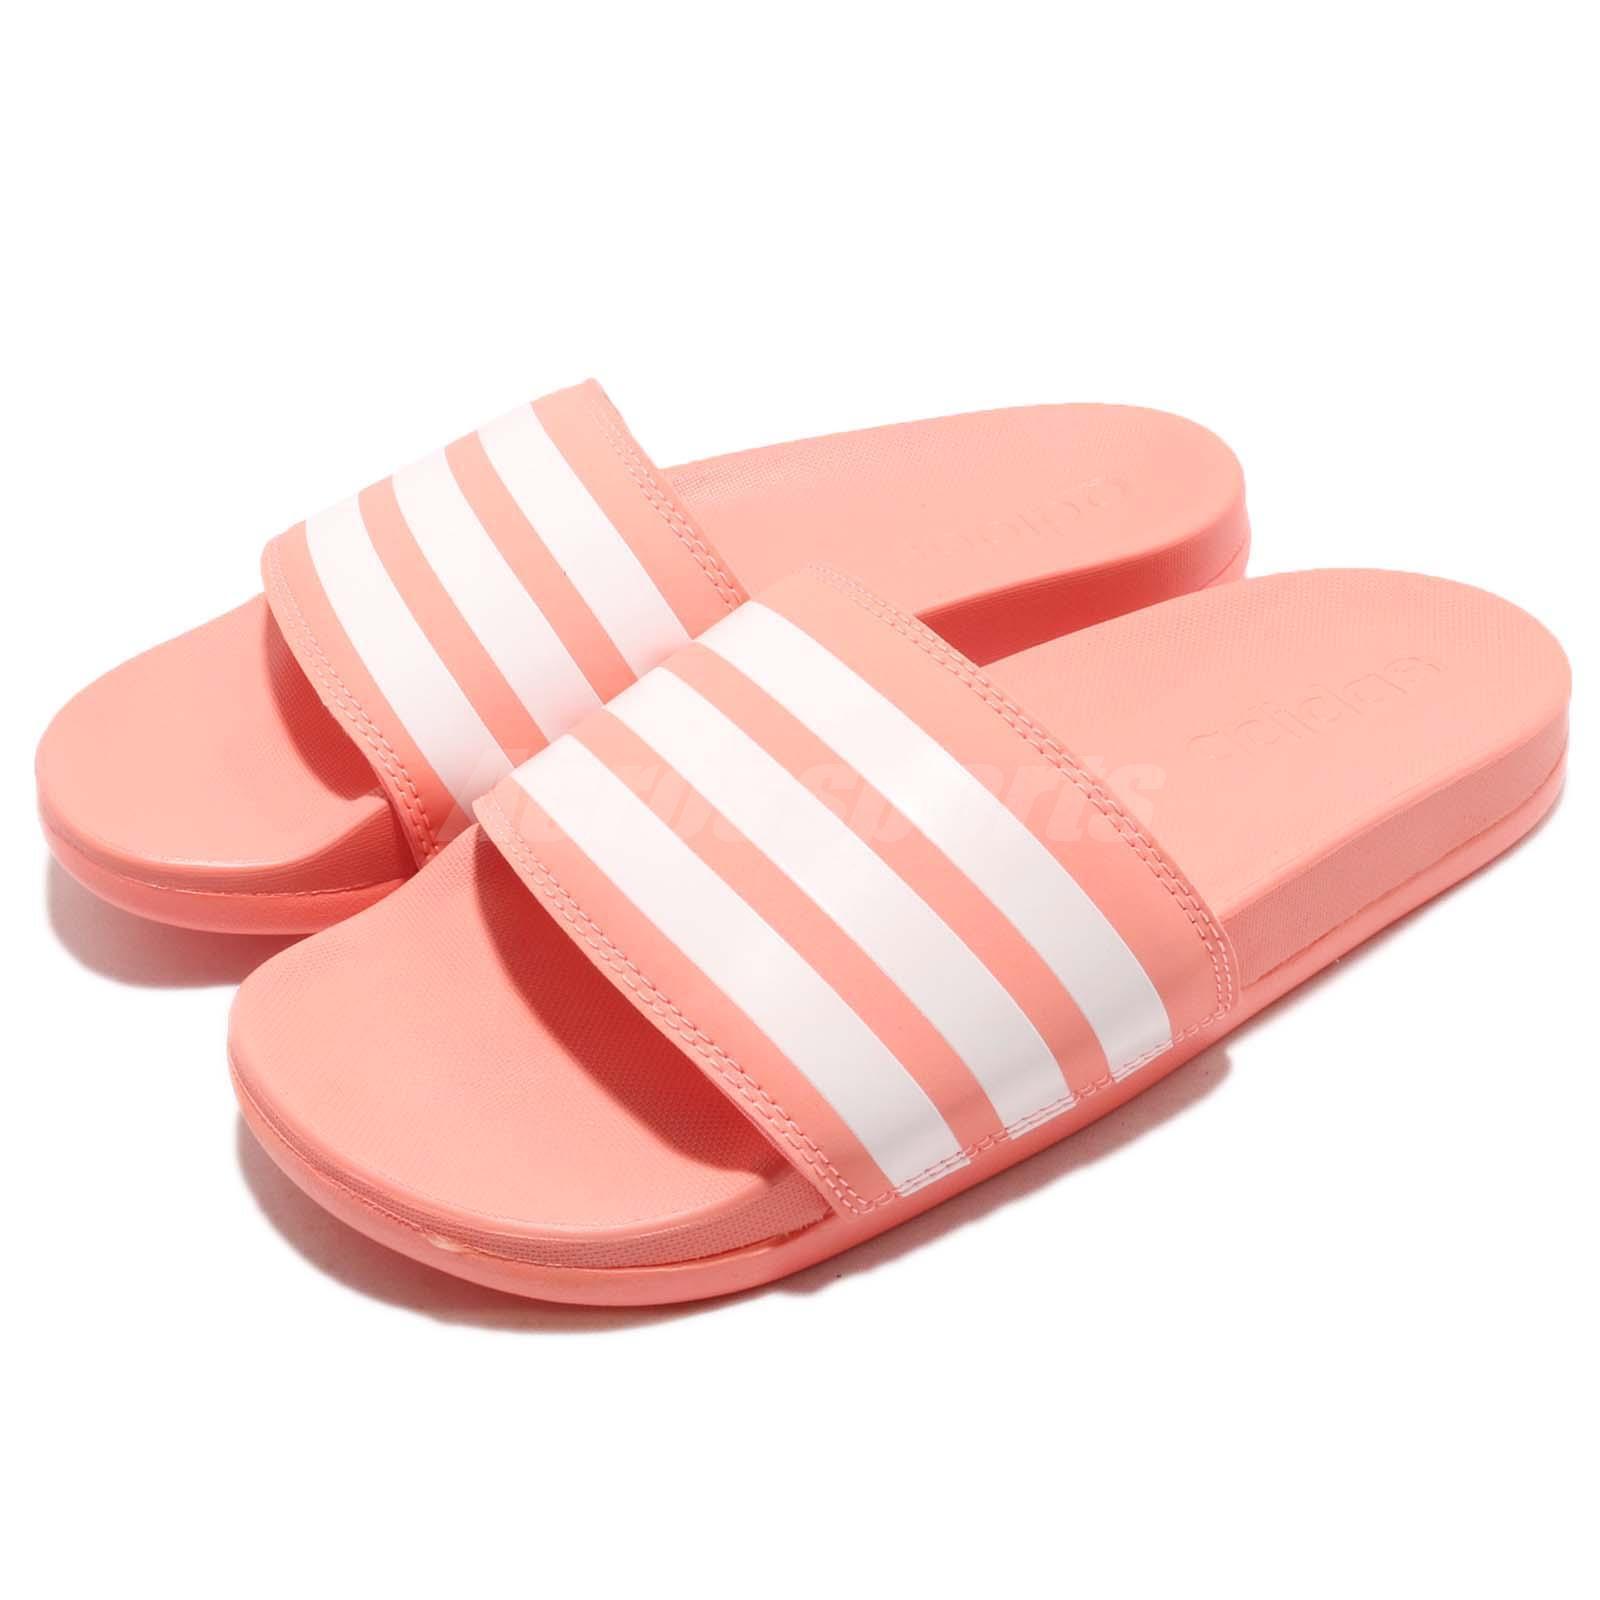 Adidas Adilette Comfort Chalk Coral blanco mujer Sports Sandals Slides B43528